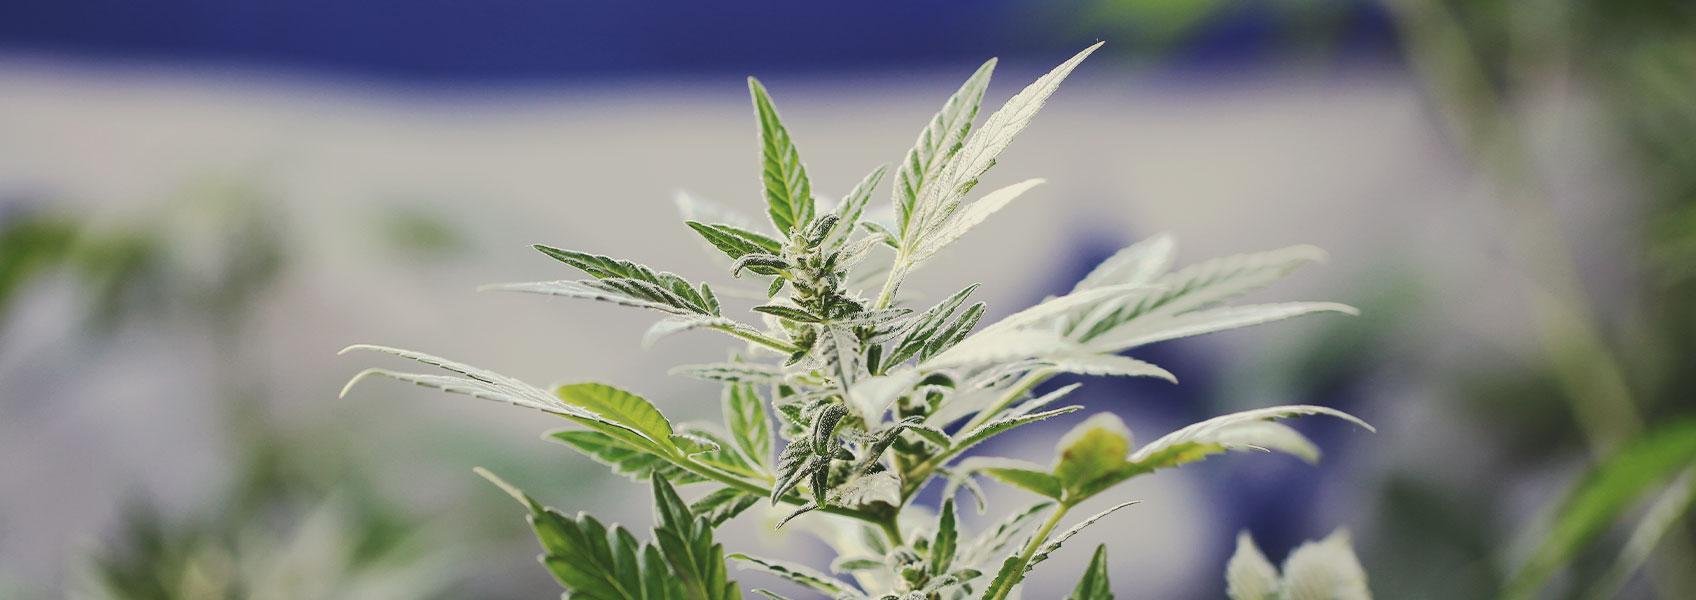 Ricerca sulla marijuana in Israele: Un modello all'avanguardia